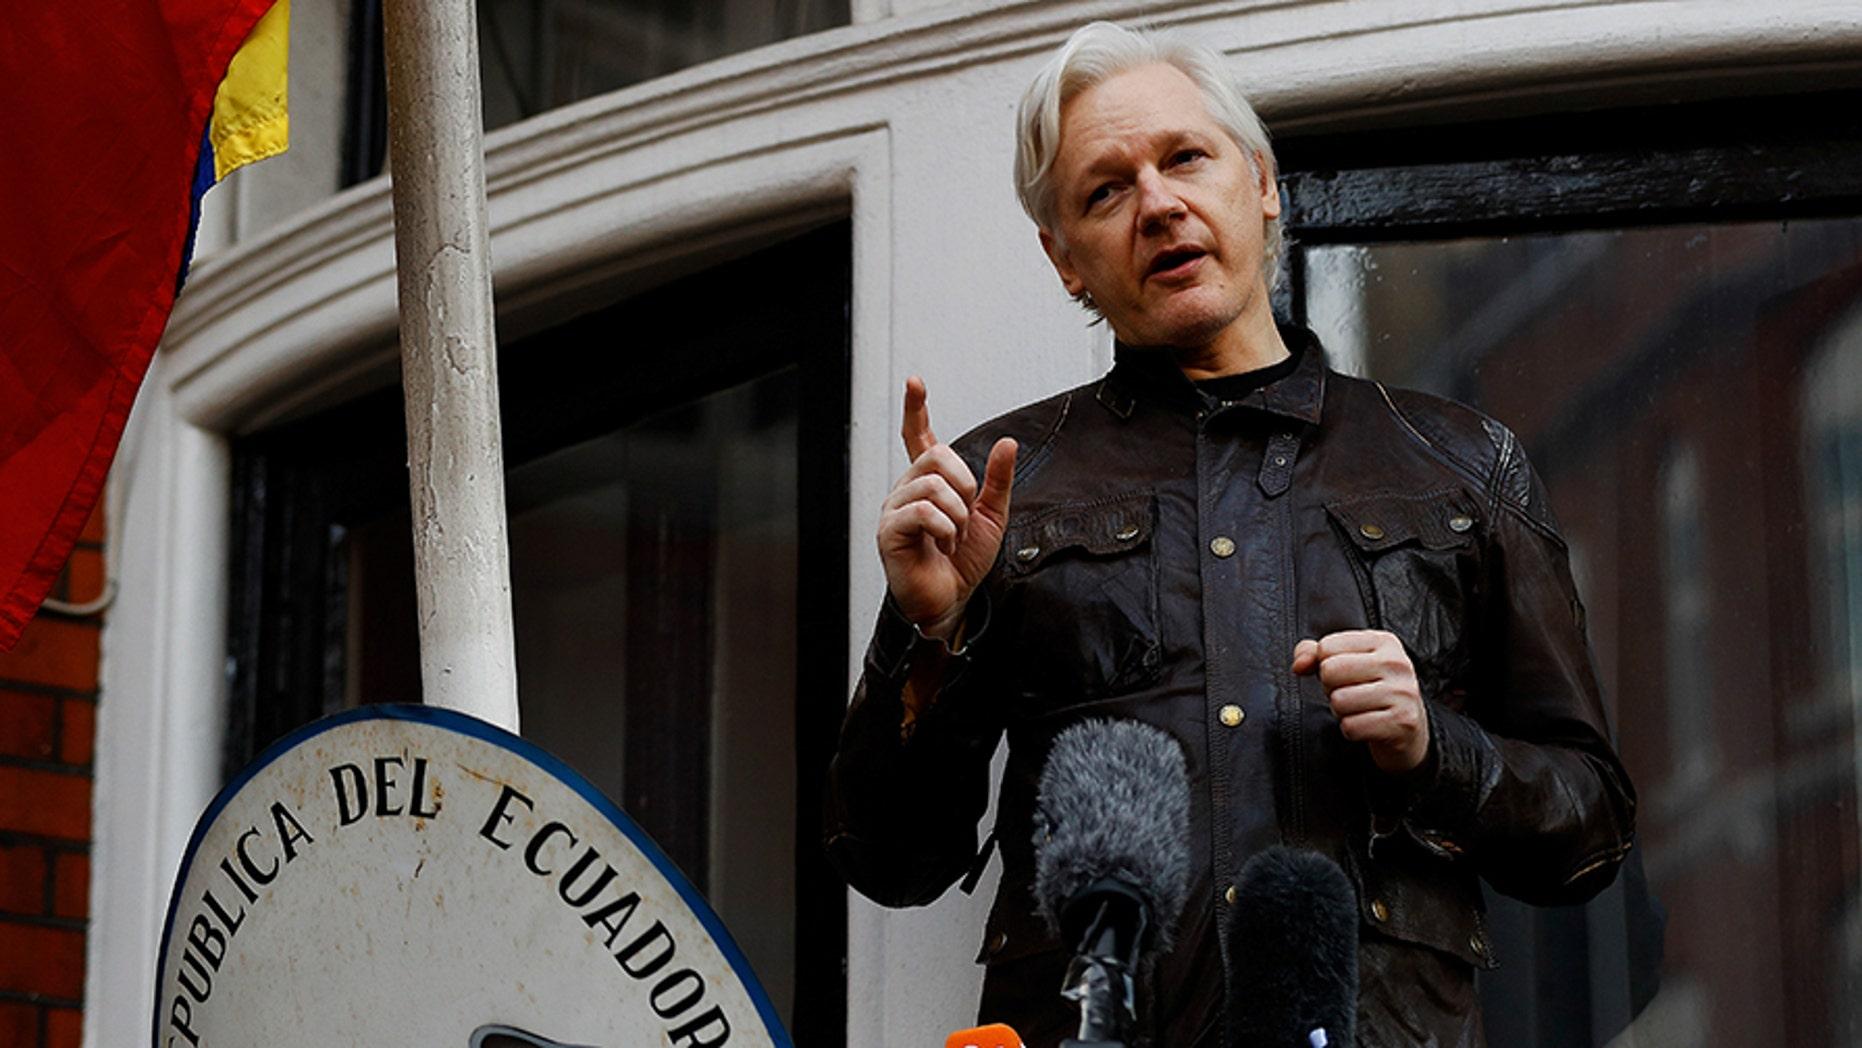 WikiLeaks founder Julian Assange is seen on the balcony of the Ecuadorian Embassy in London, Britain, May 19, 2017.